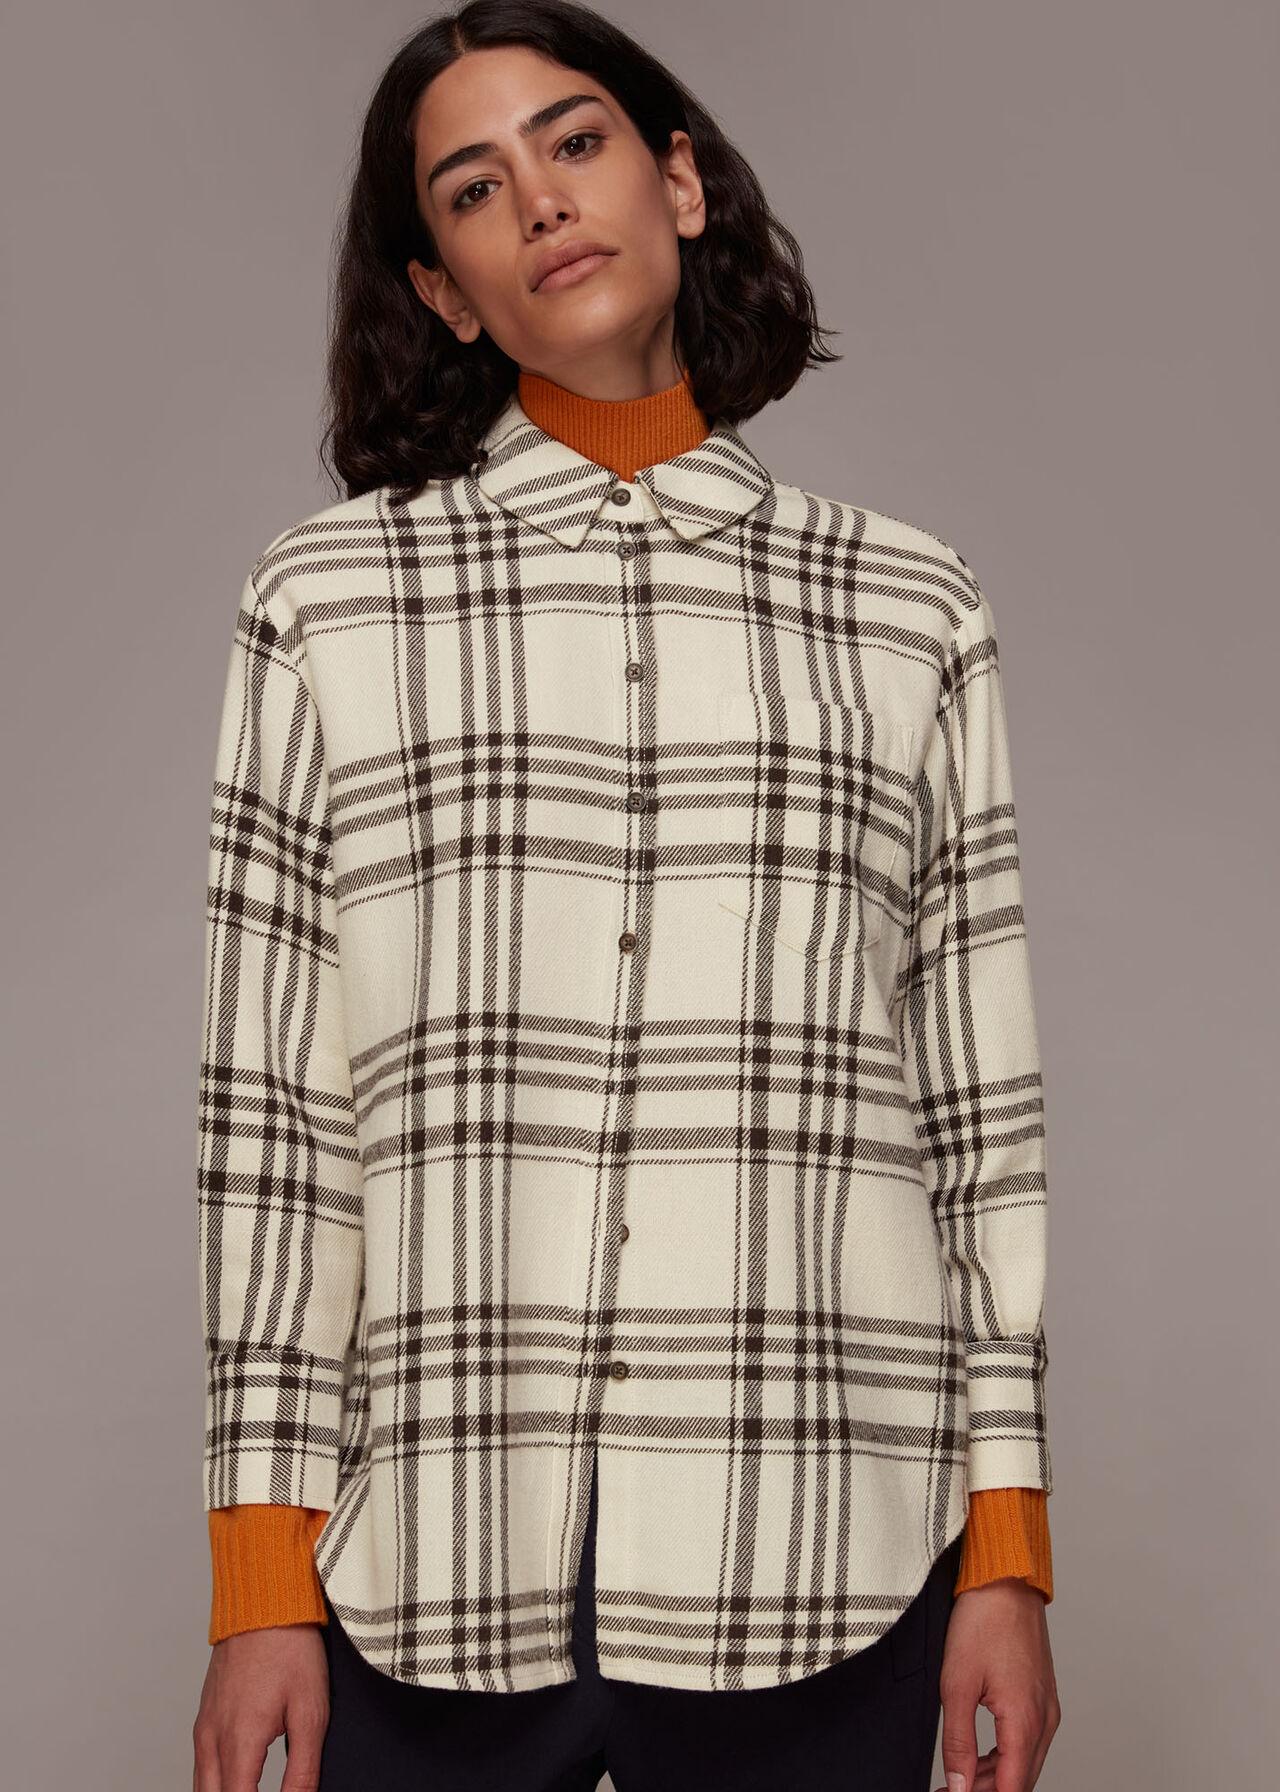 Oversized Check Cotton Shirt